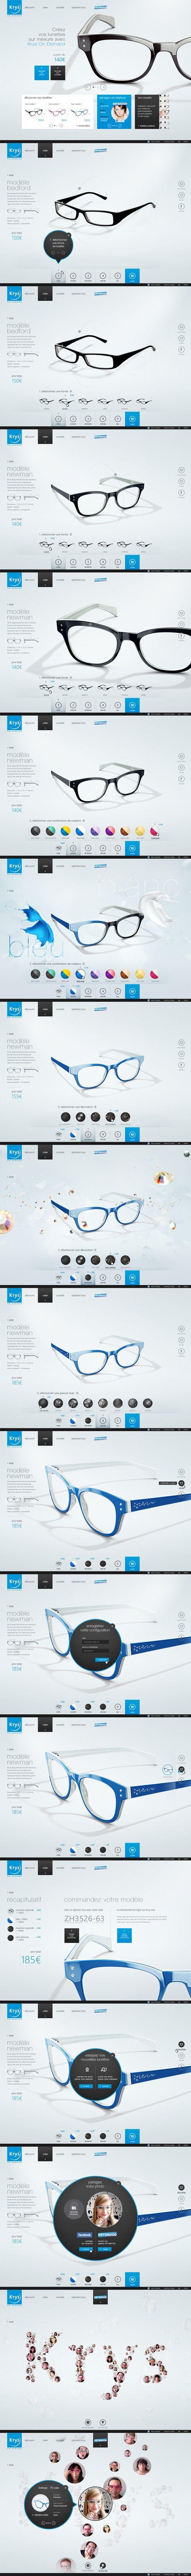 UX/UI Design / Krys Configurator by Yul